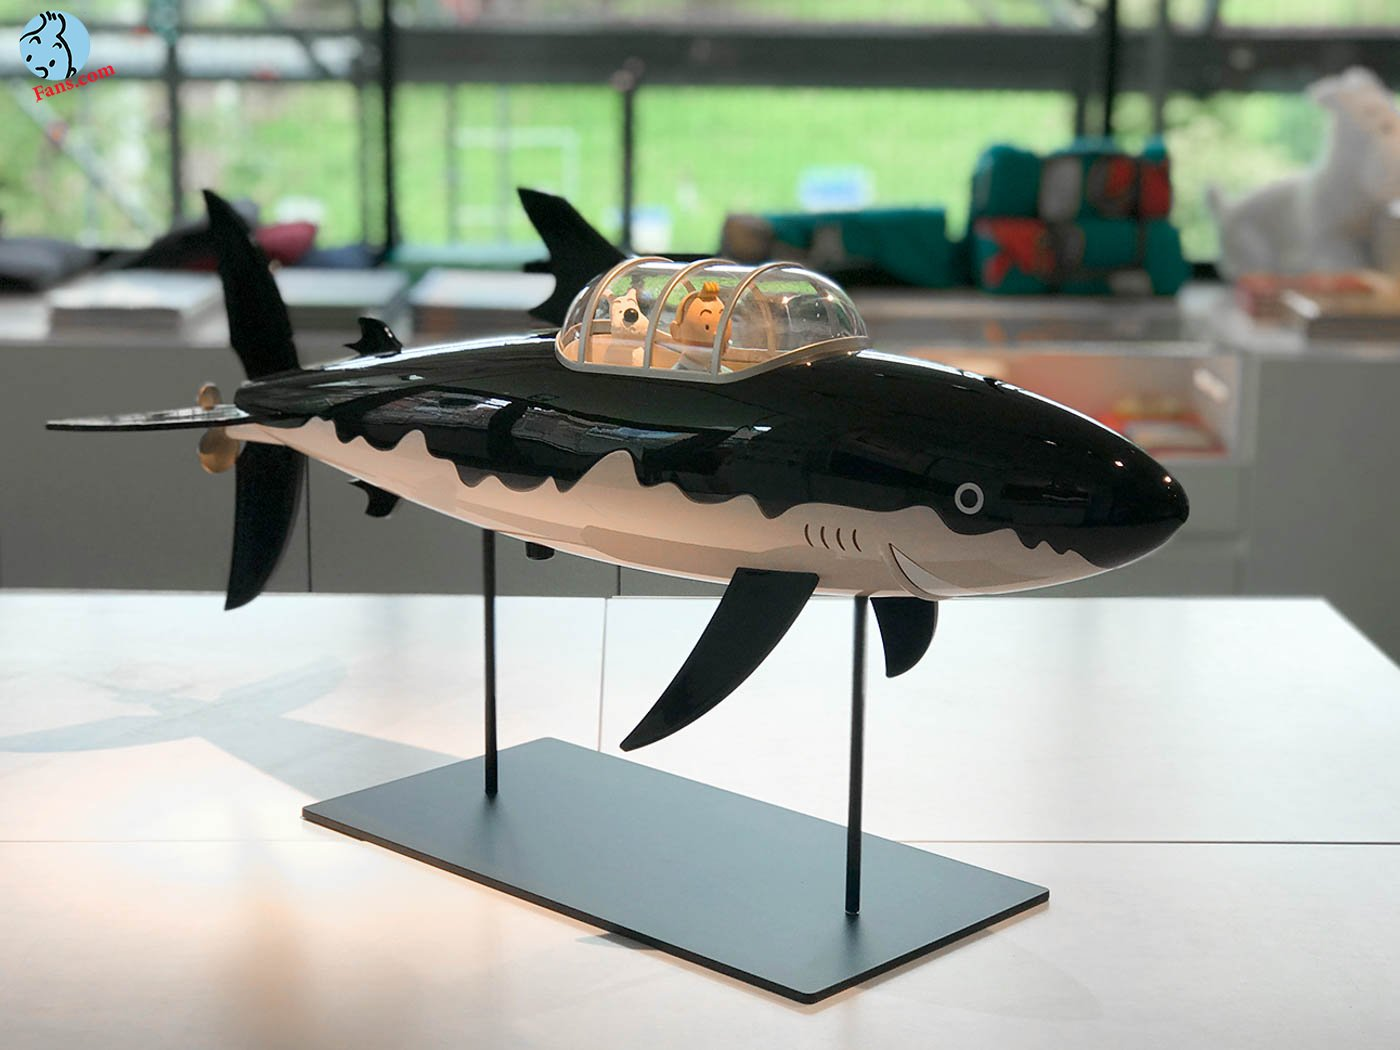 فیگور جدید زیردریایی تورنسل !